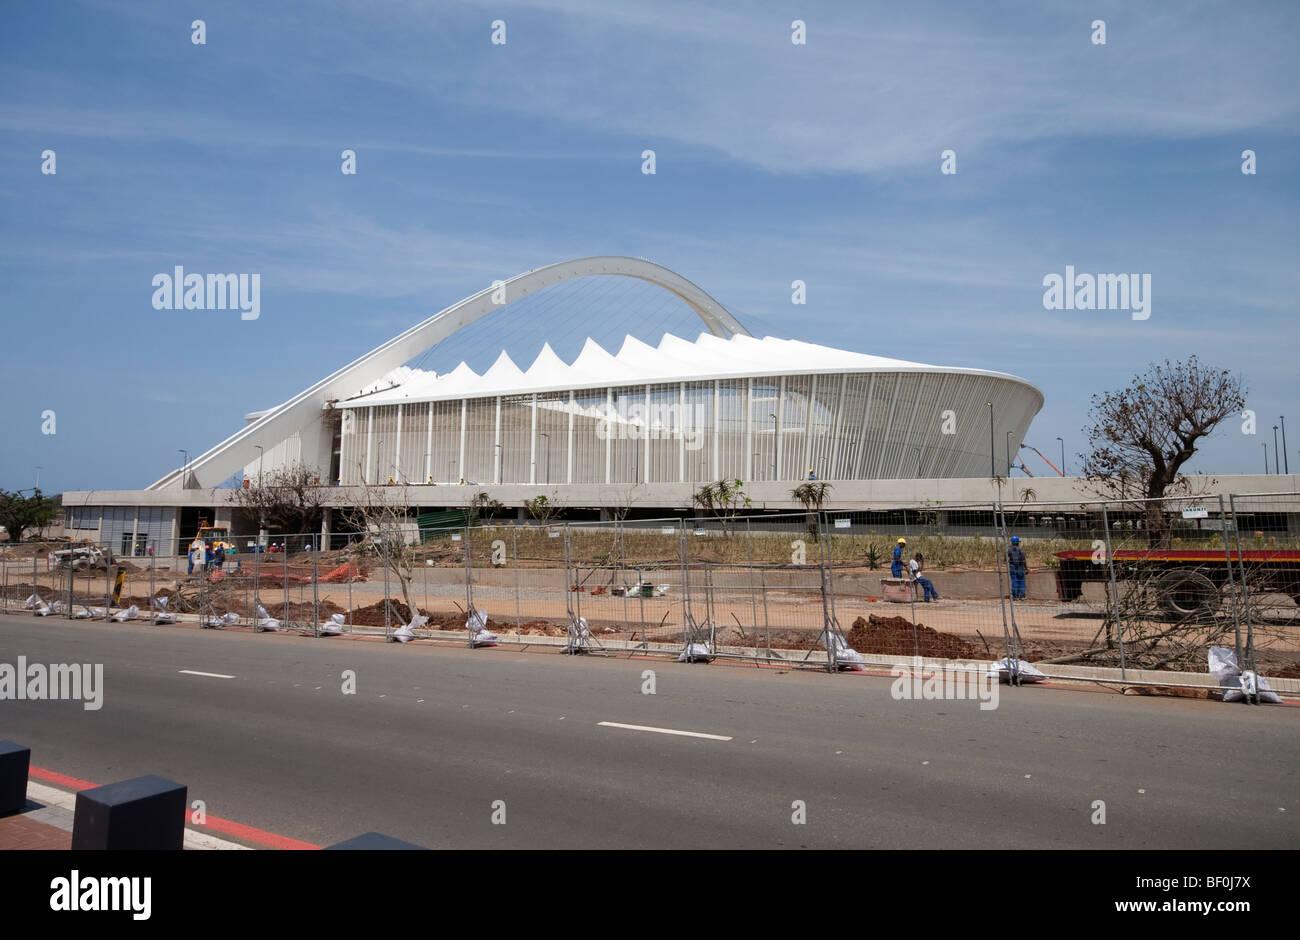 Moses Mabhida stadium in Durban, South Africa - Stock Image